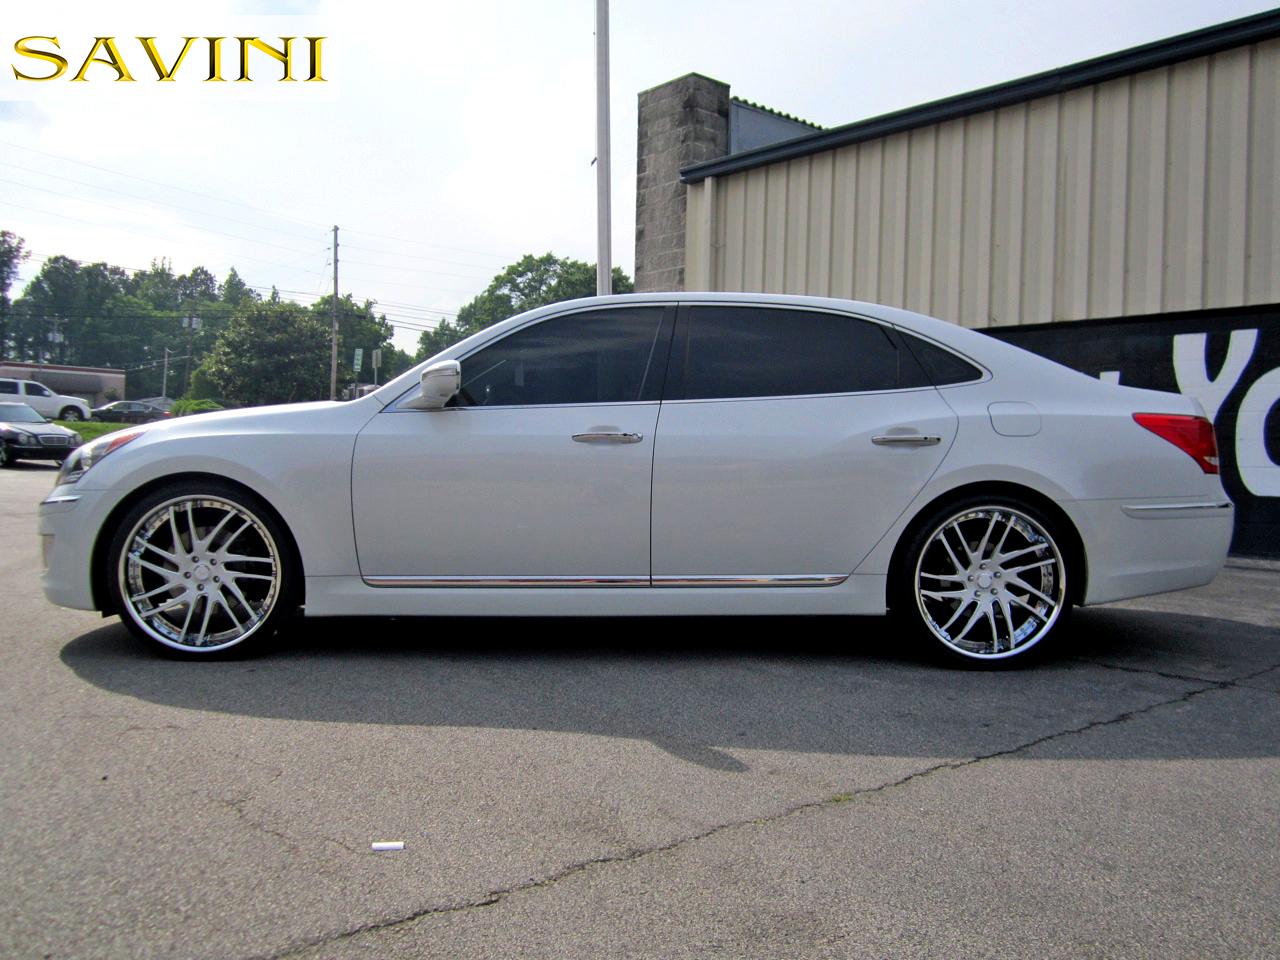 Bmwpetition Mercedes Benz Of Tampa Florida Mercedes Benz